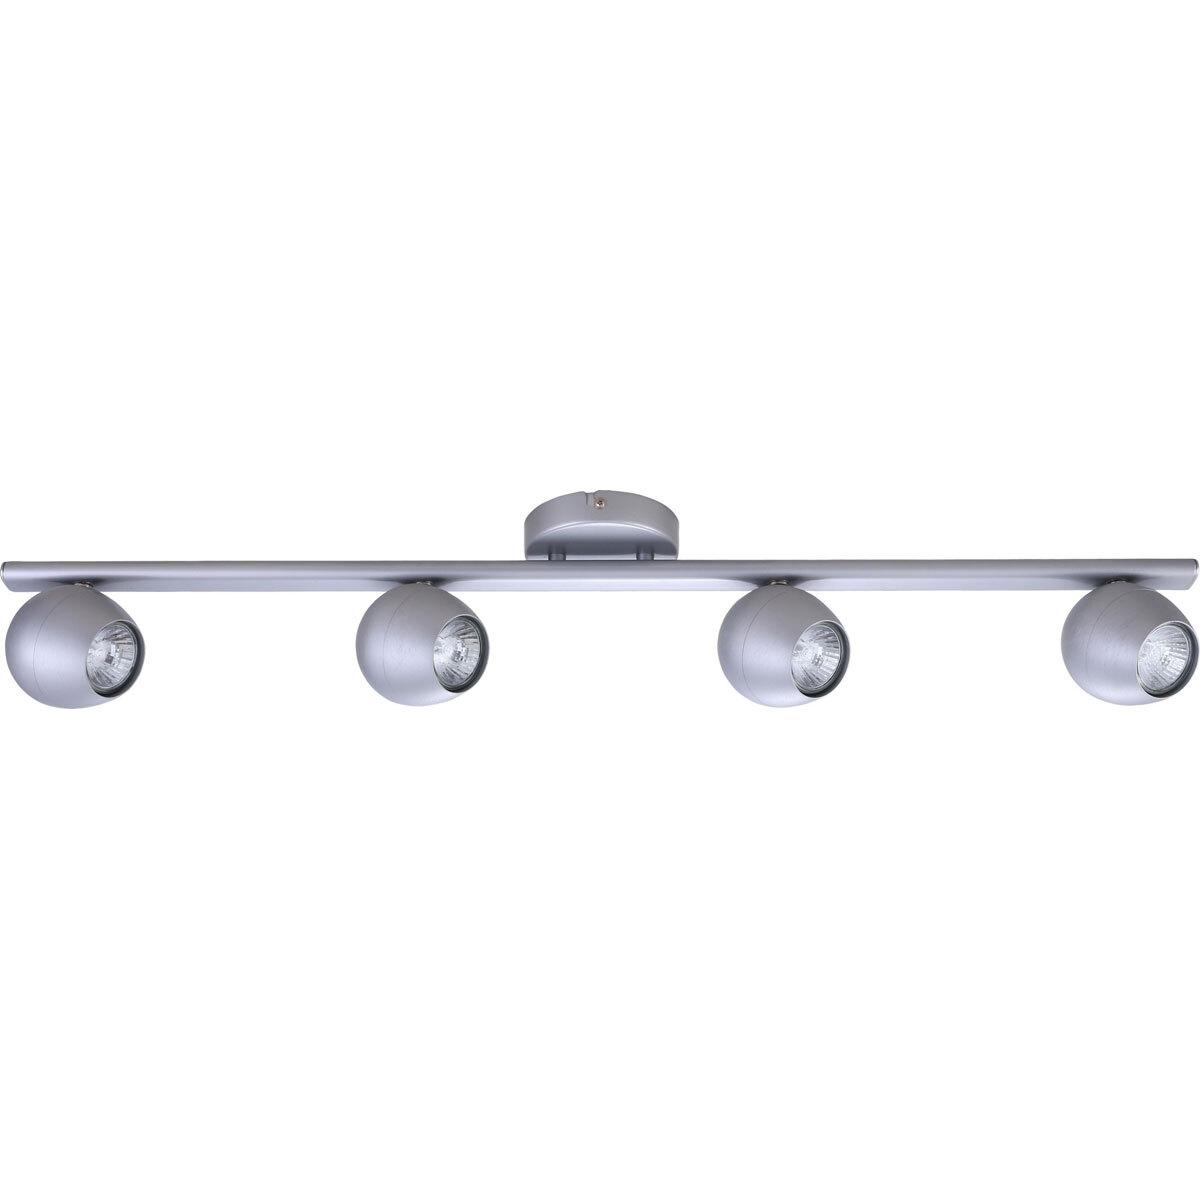 Спот Arte Lamp SFERA A5781PL-4SS, GU10, 200 Вт